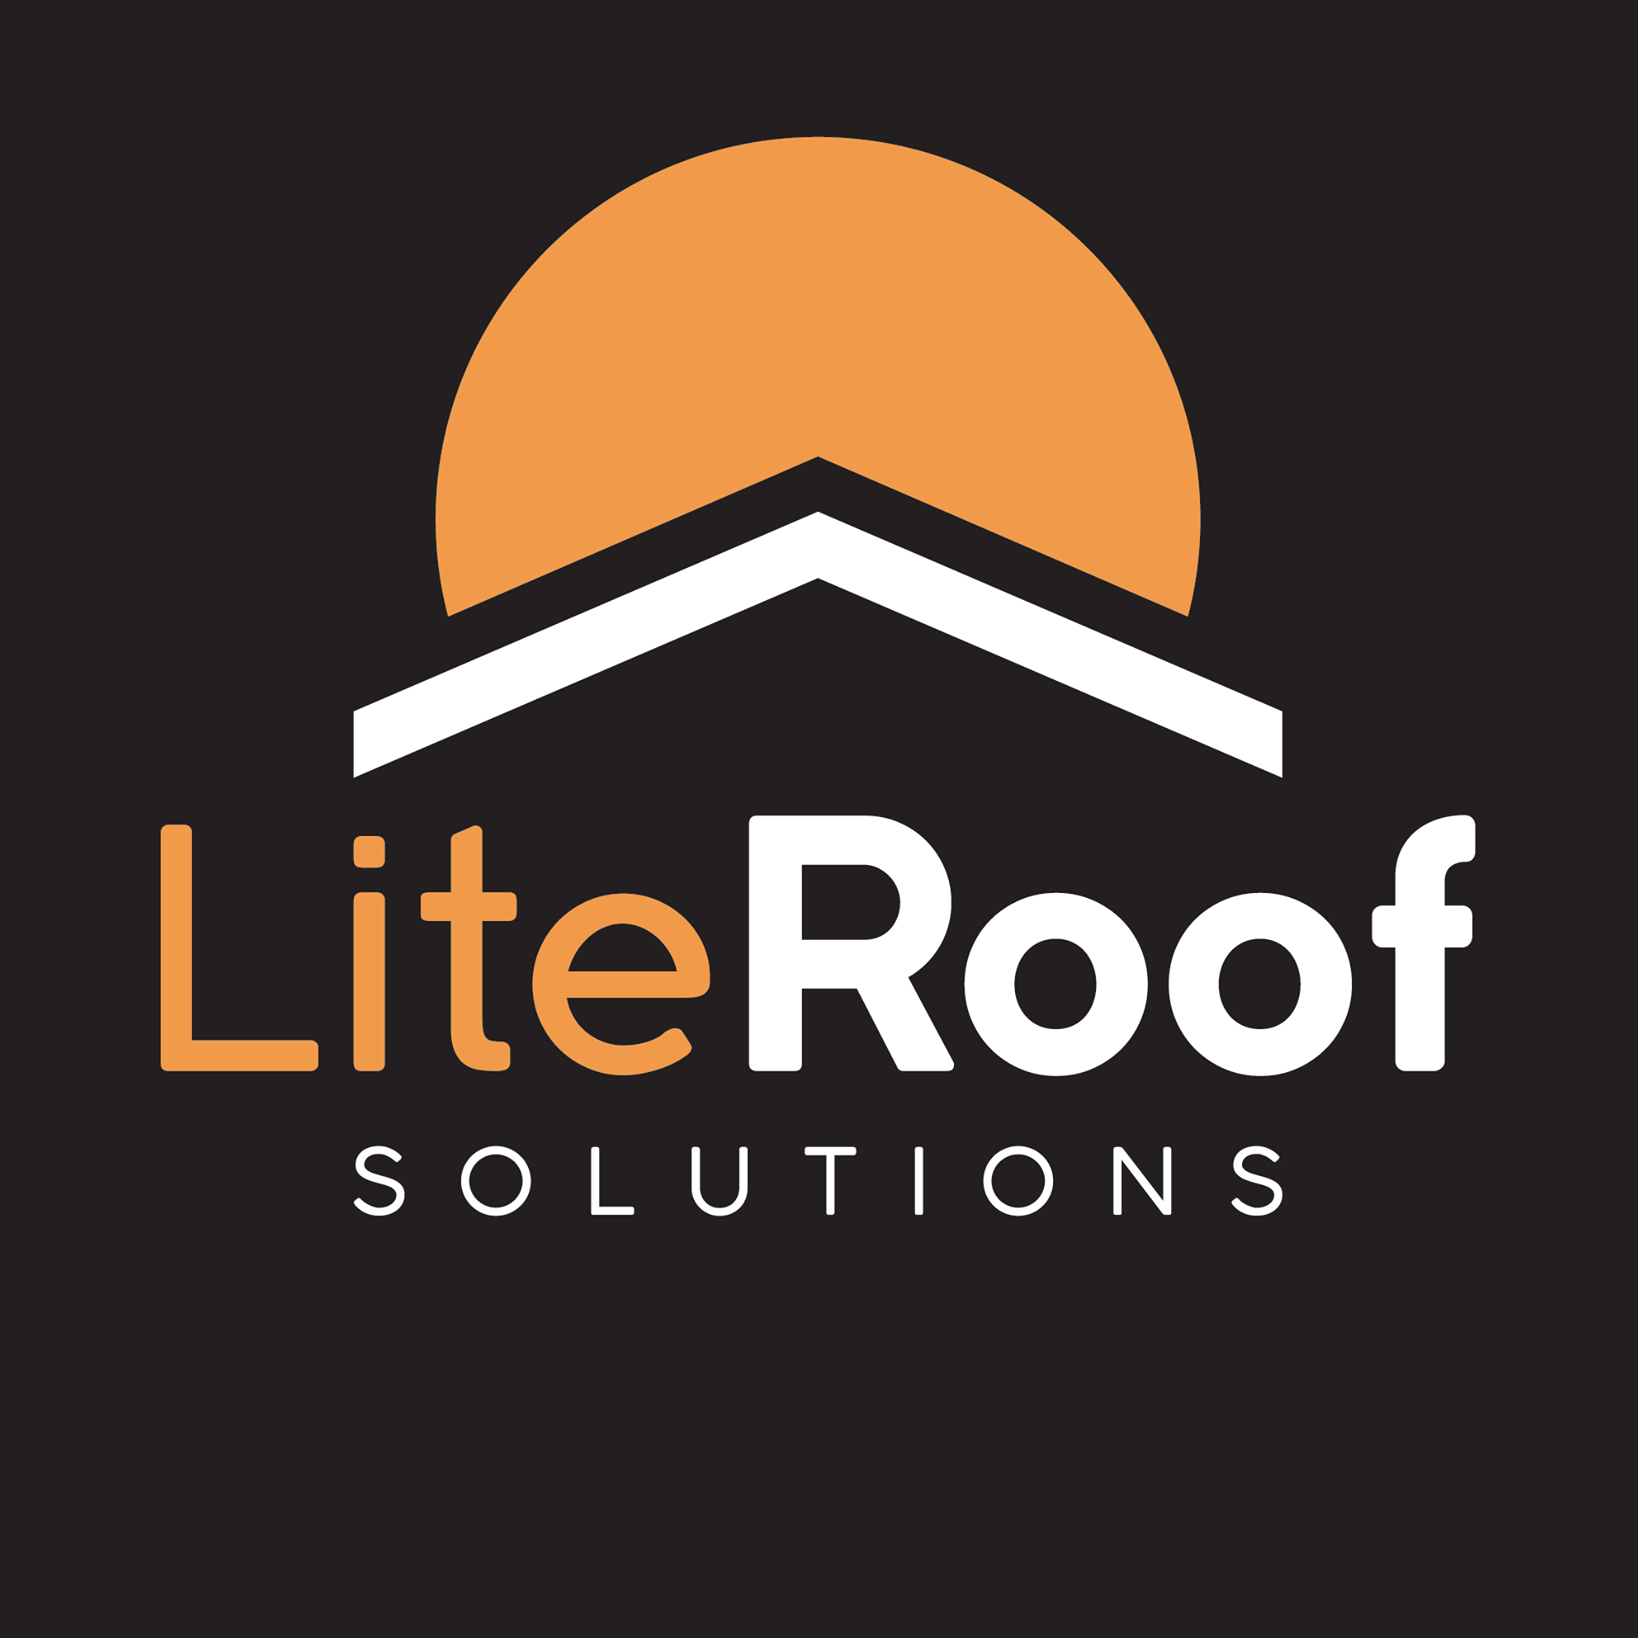 LiteRoof Solutions